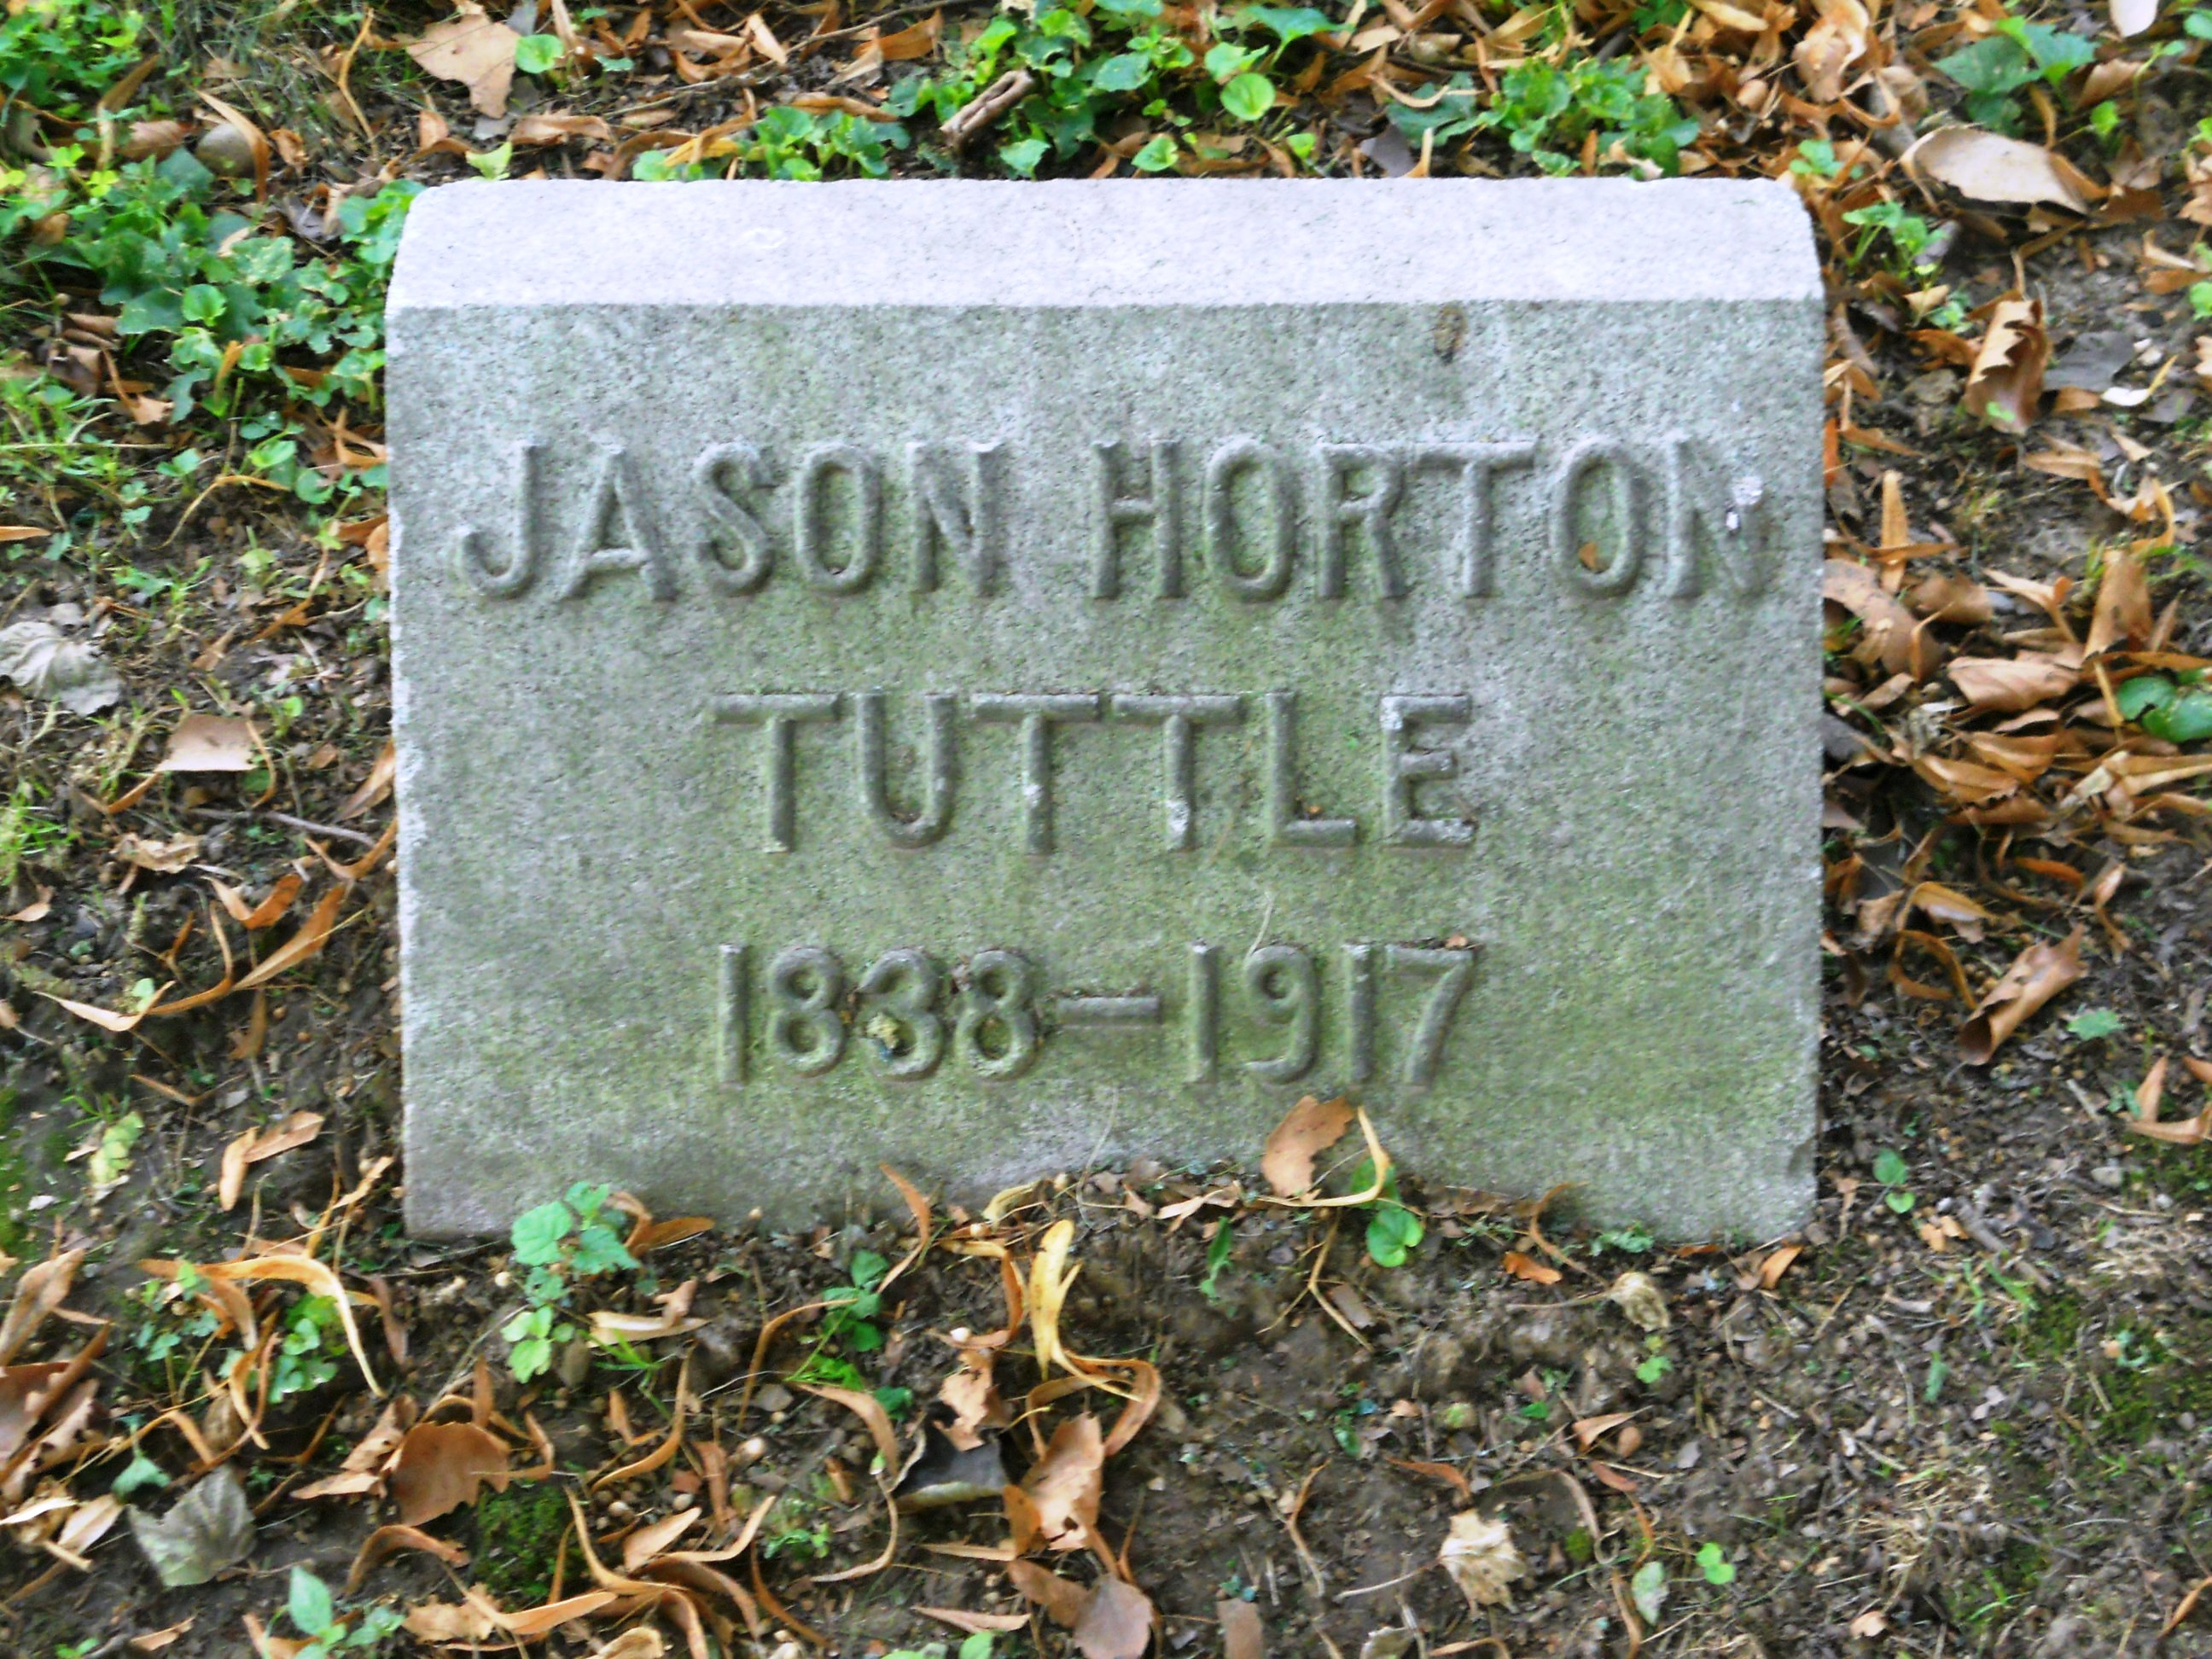 Jason Horton Tuttle